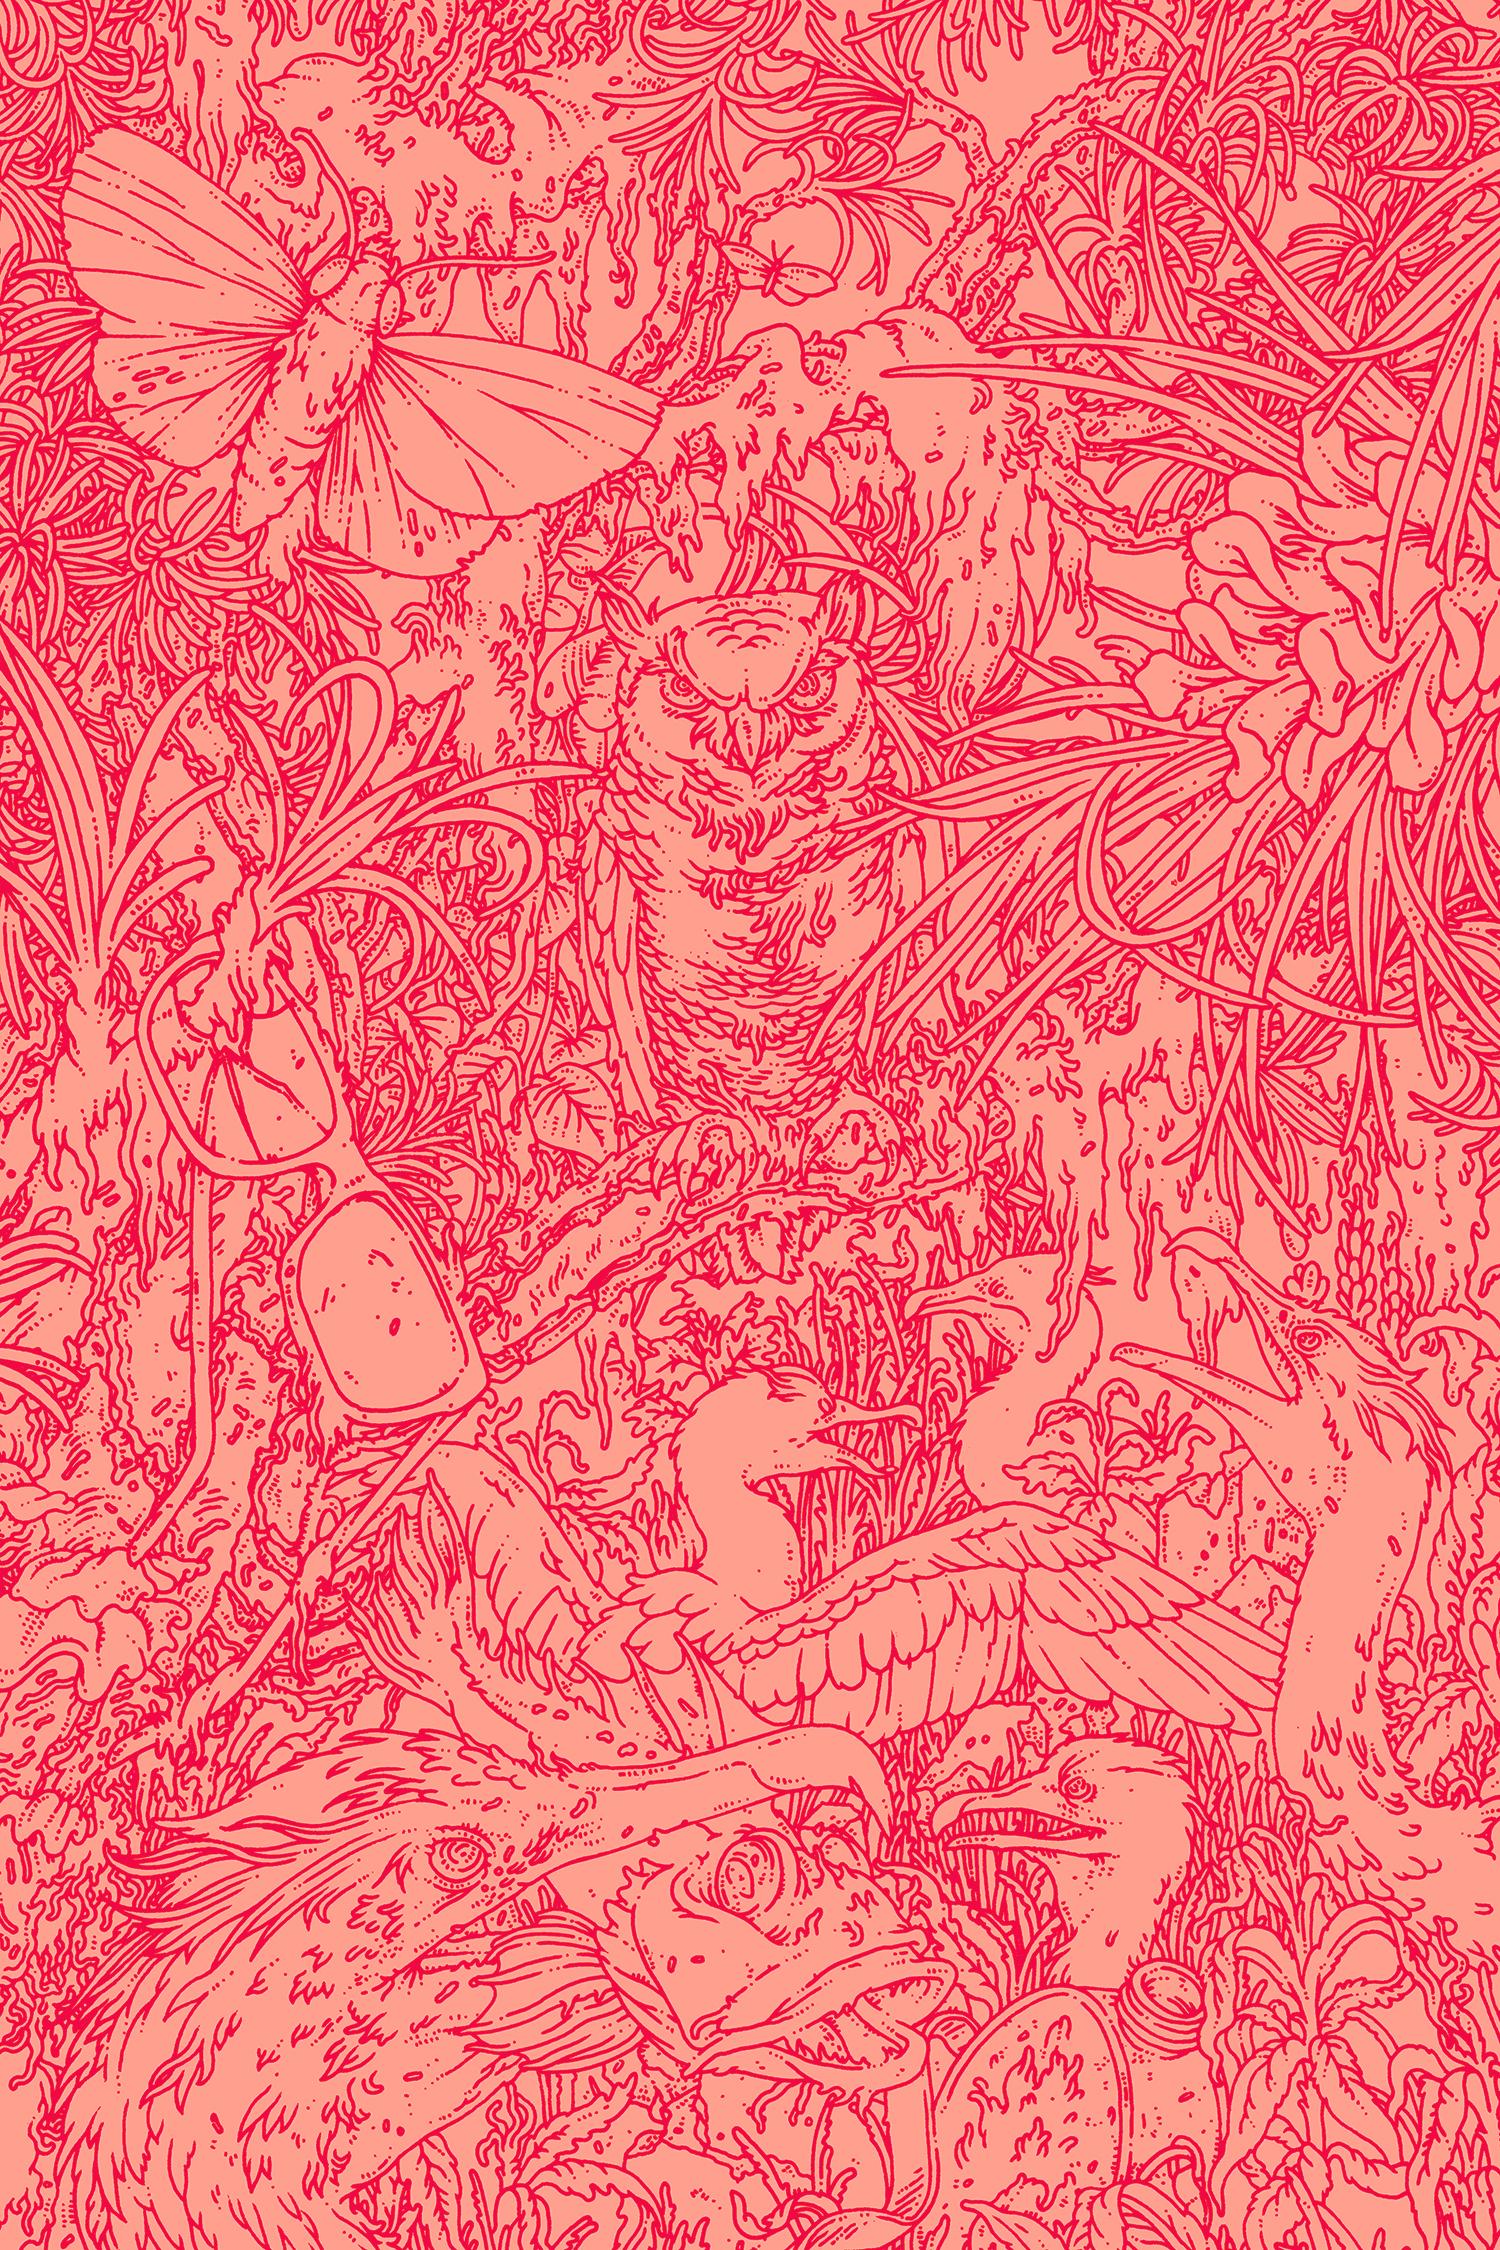 Farrar Straus Giroux. Inside artwork for Jeff Vandermeer's Acceptance. AD Charlotte Strick.